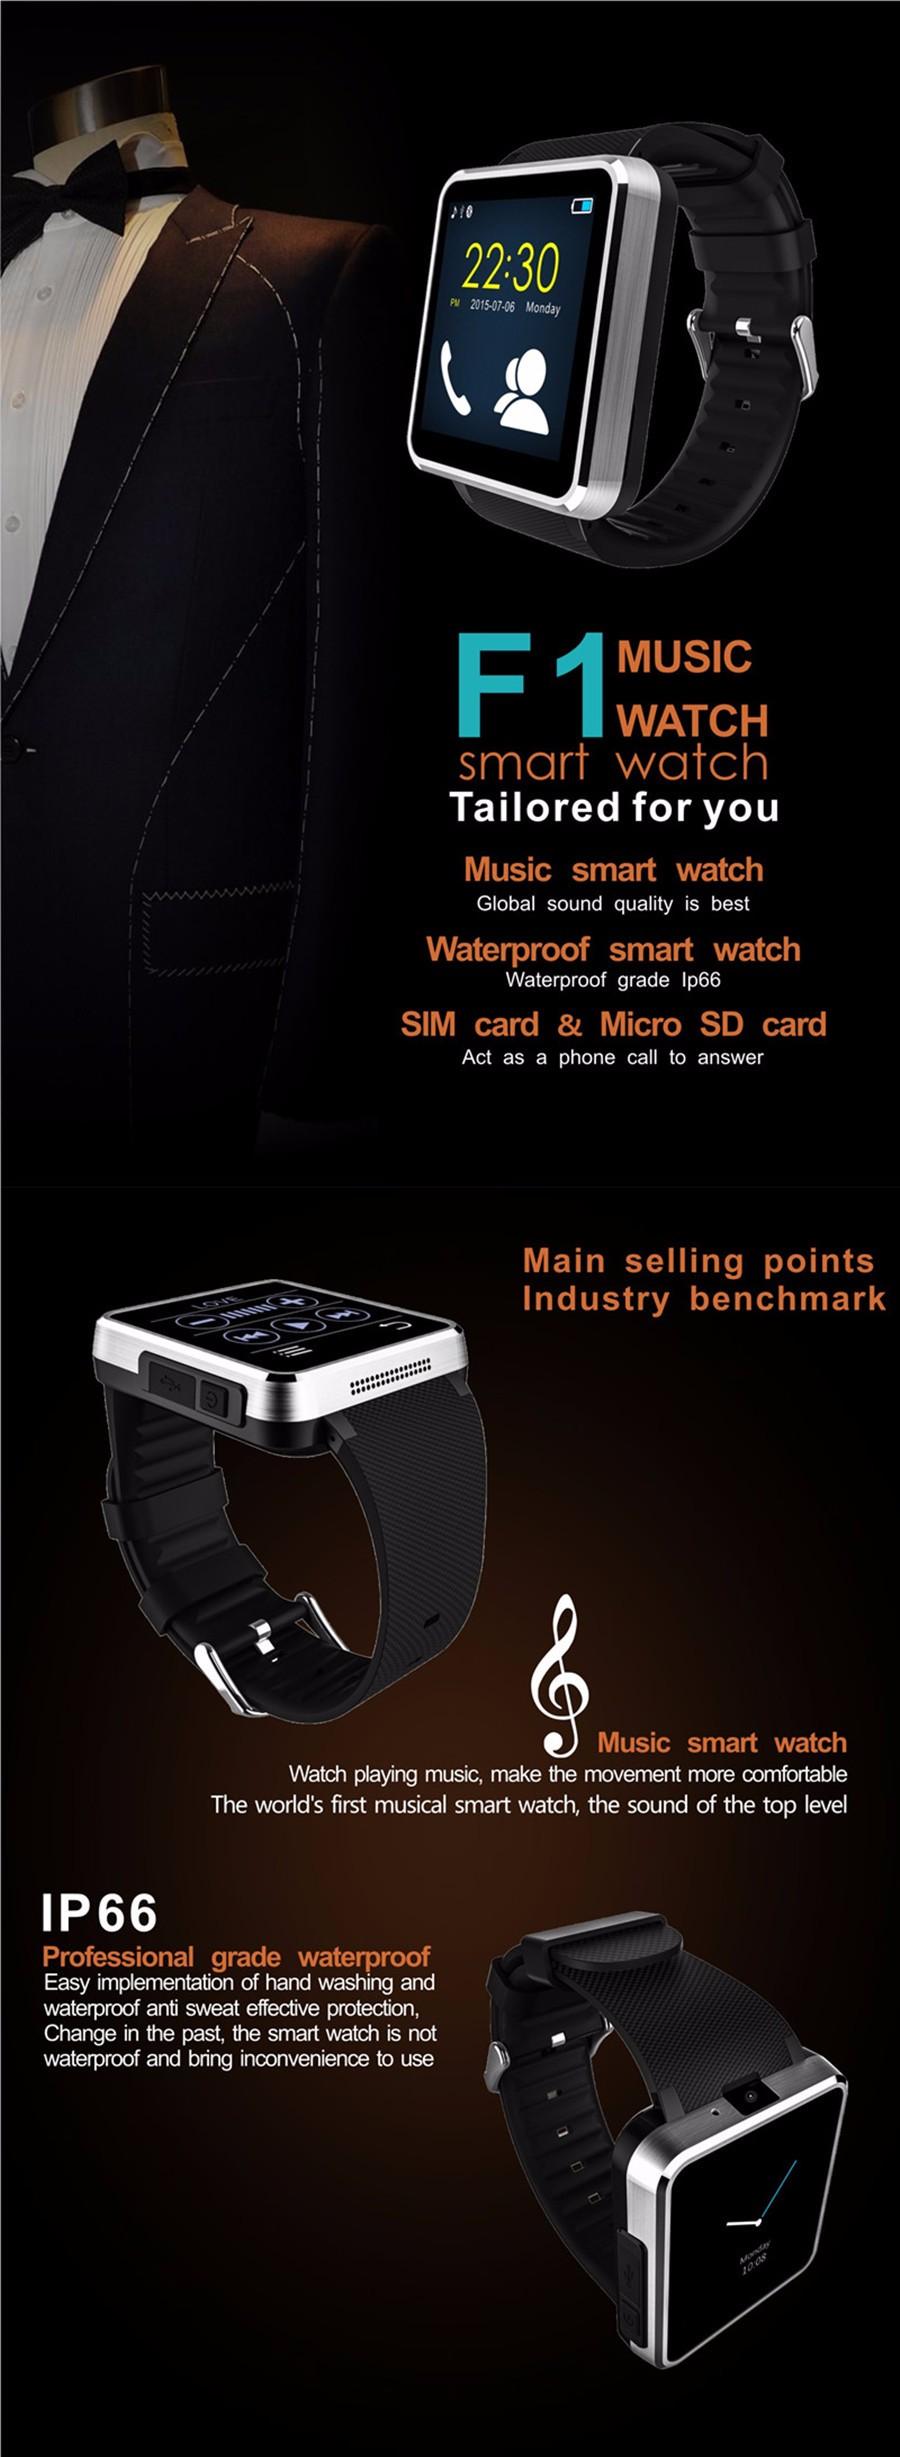 1 watch